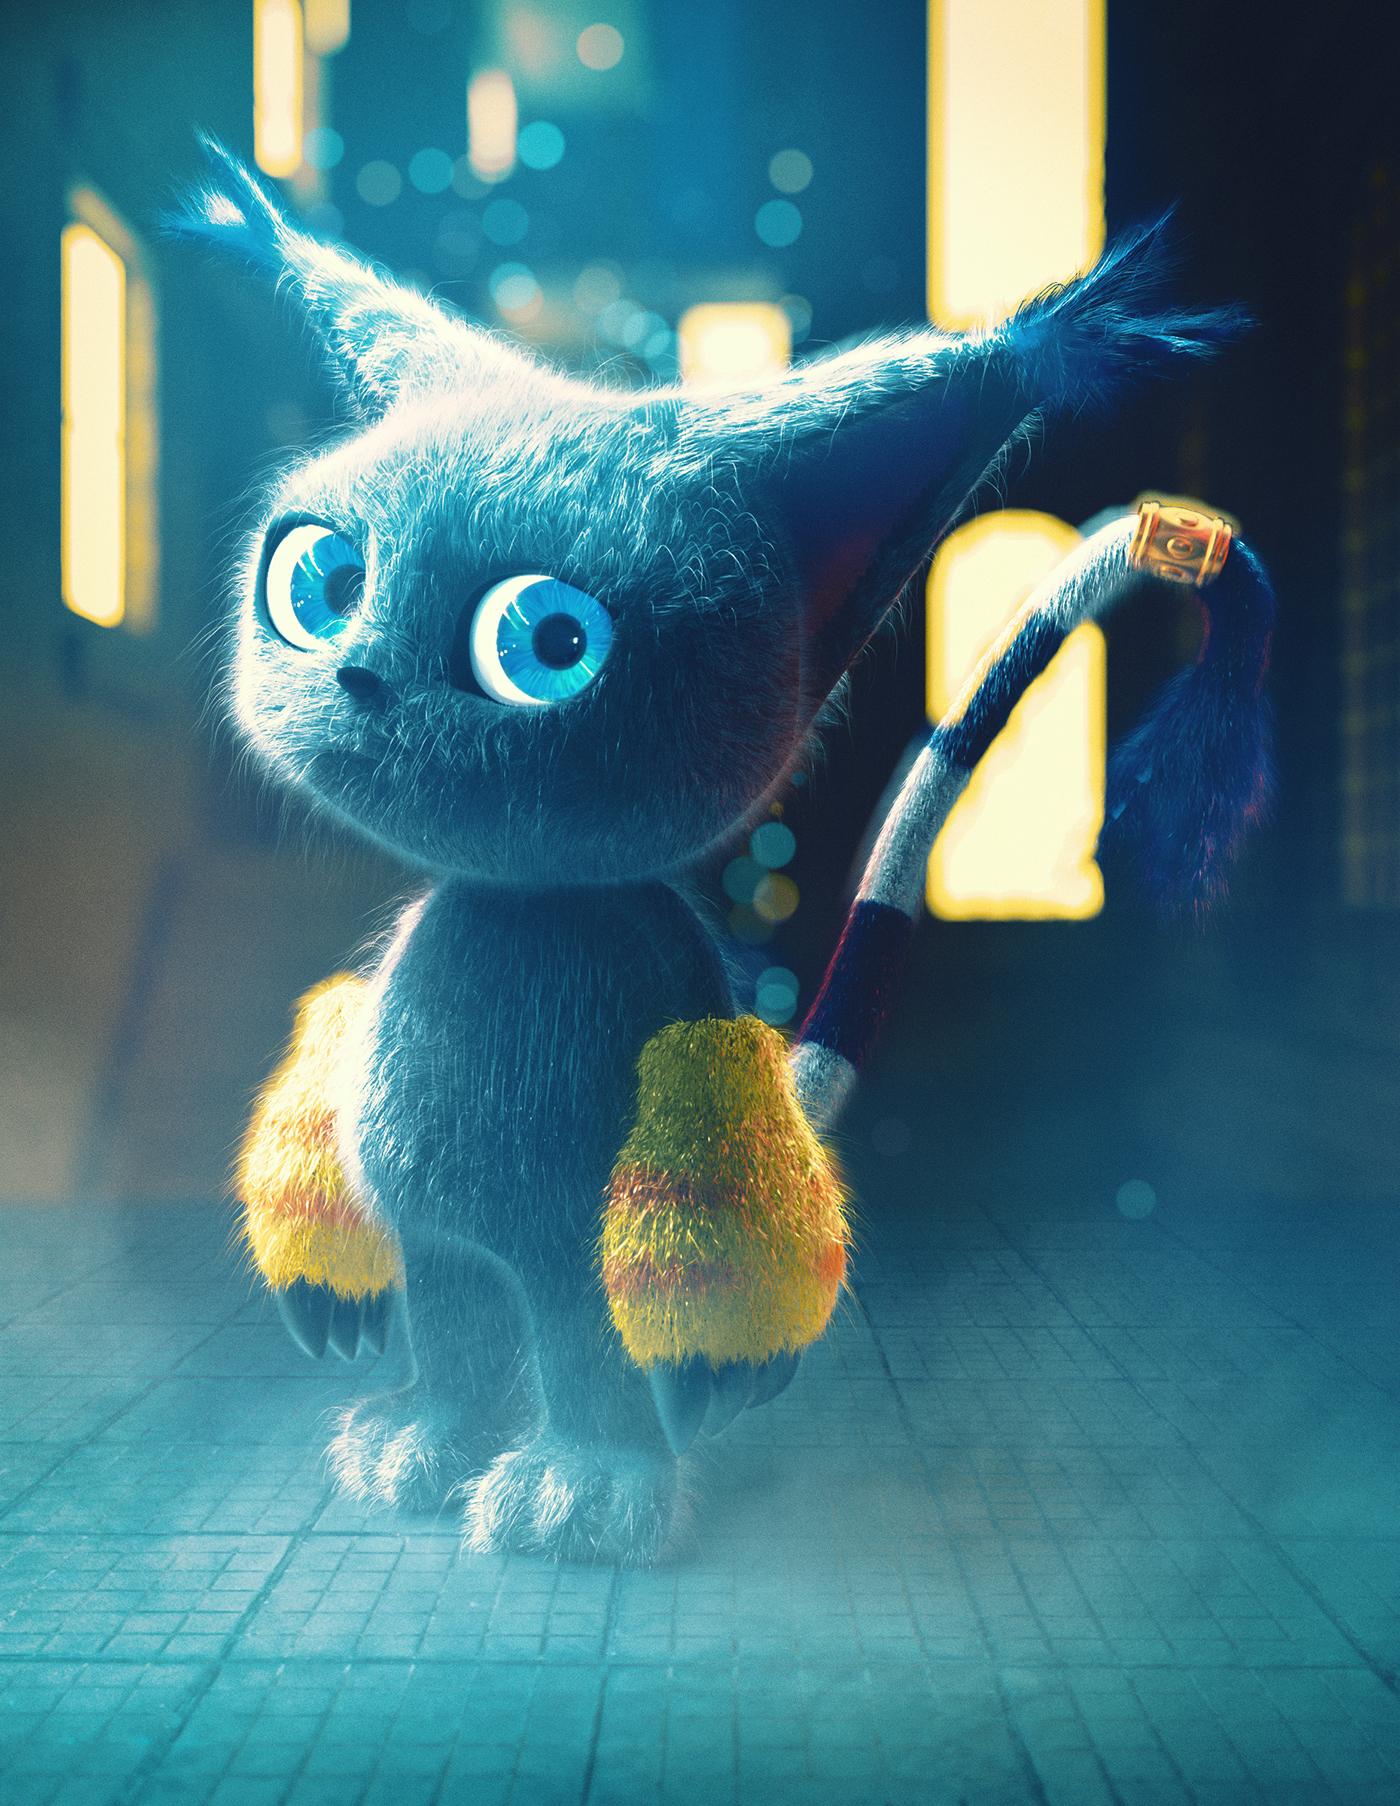 pechan reptar kero GATOMON Kerberos ranma twostupiddogs Digimon 3d guatemala Guatemala